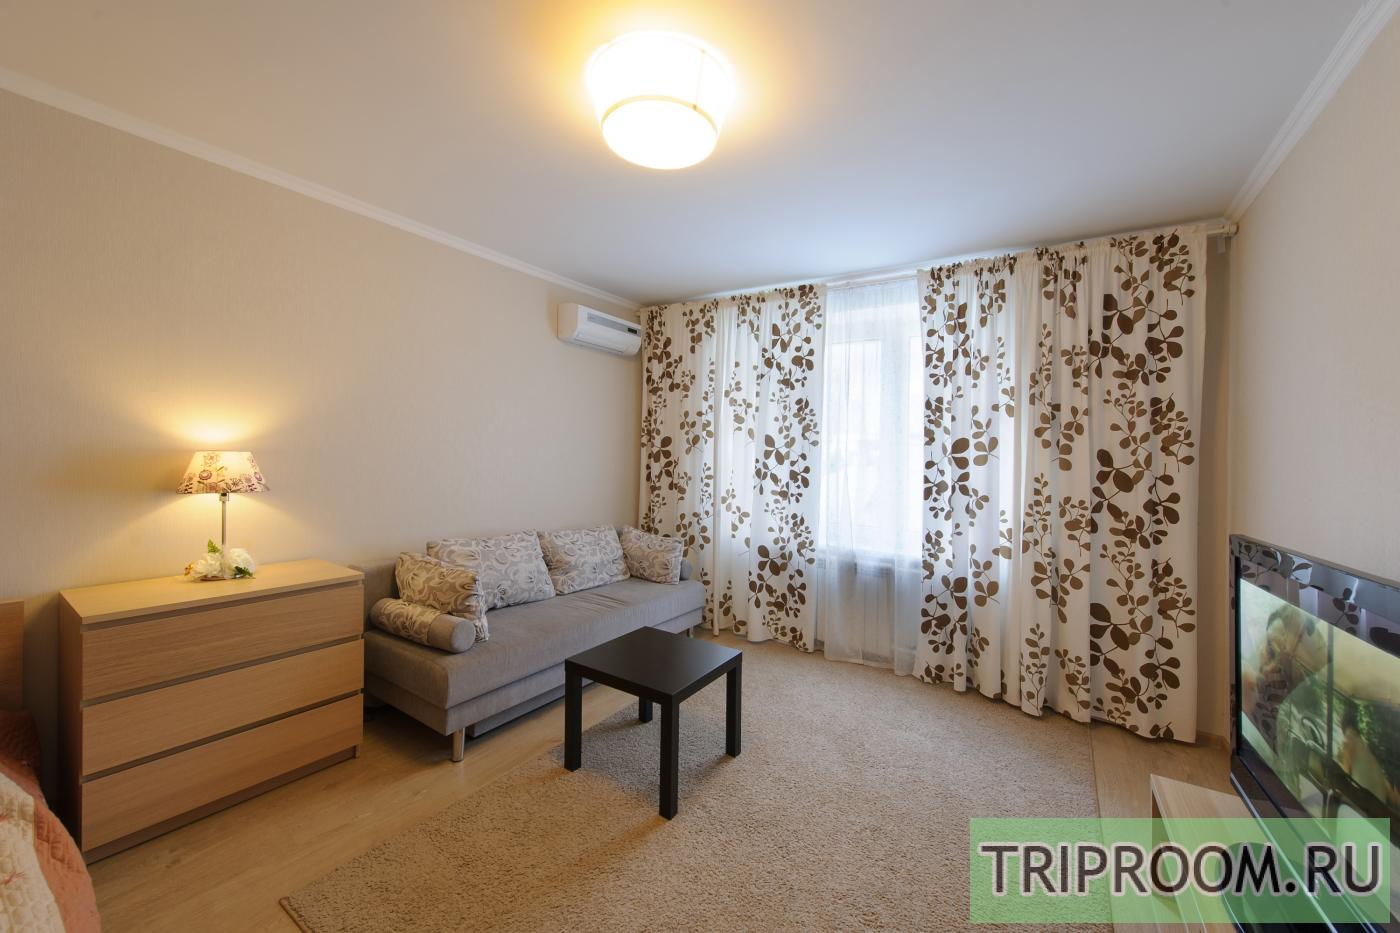 http://www.triproom.ru/photo/big/959a9e8947f765489fe8f73d8dcc3fba.jpg